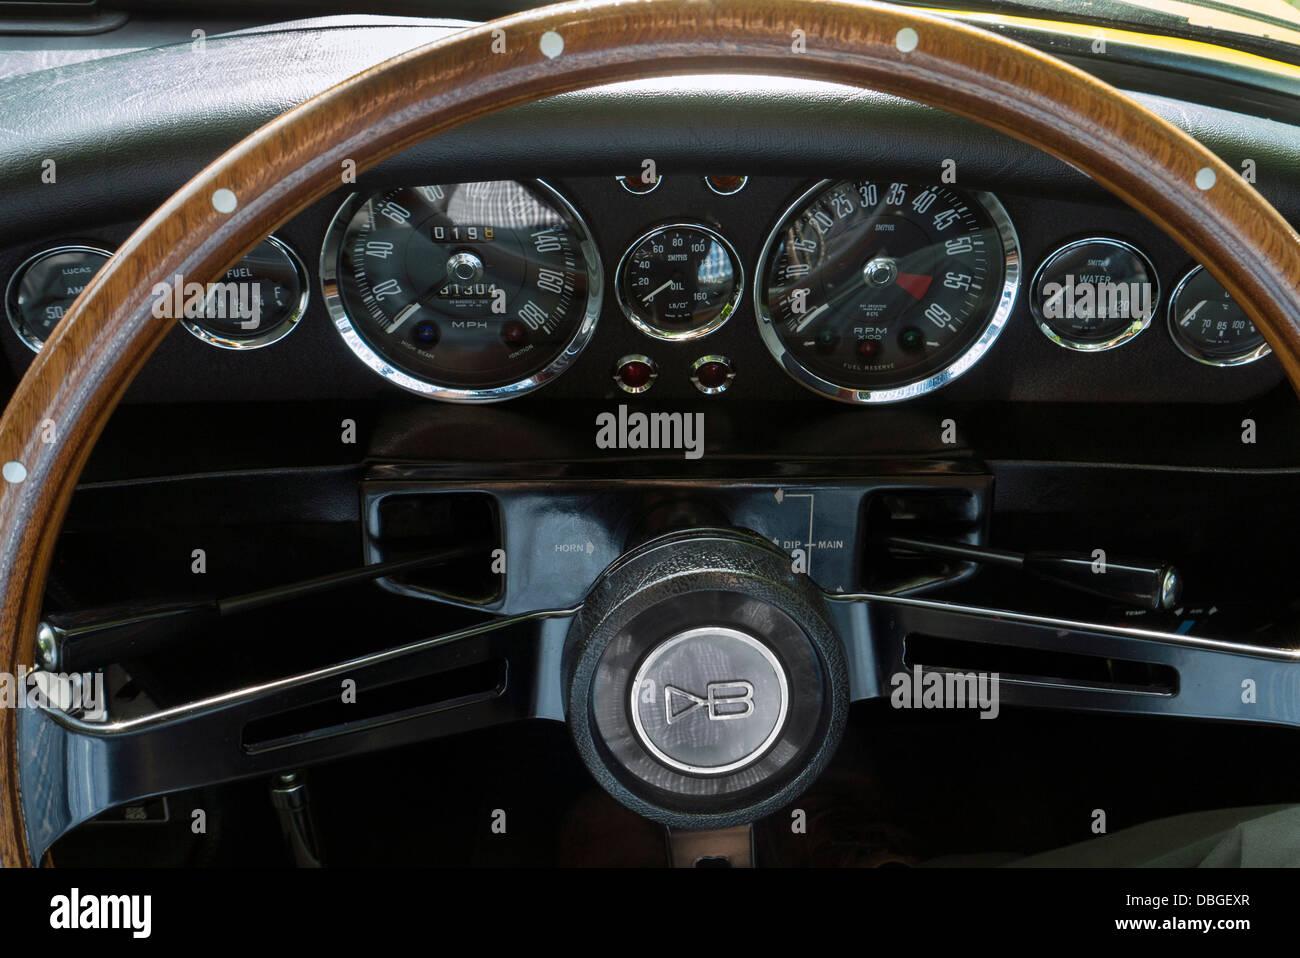 1970 Aston Martin DBS dashboard and steering wheel - Stock Image